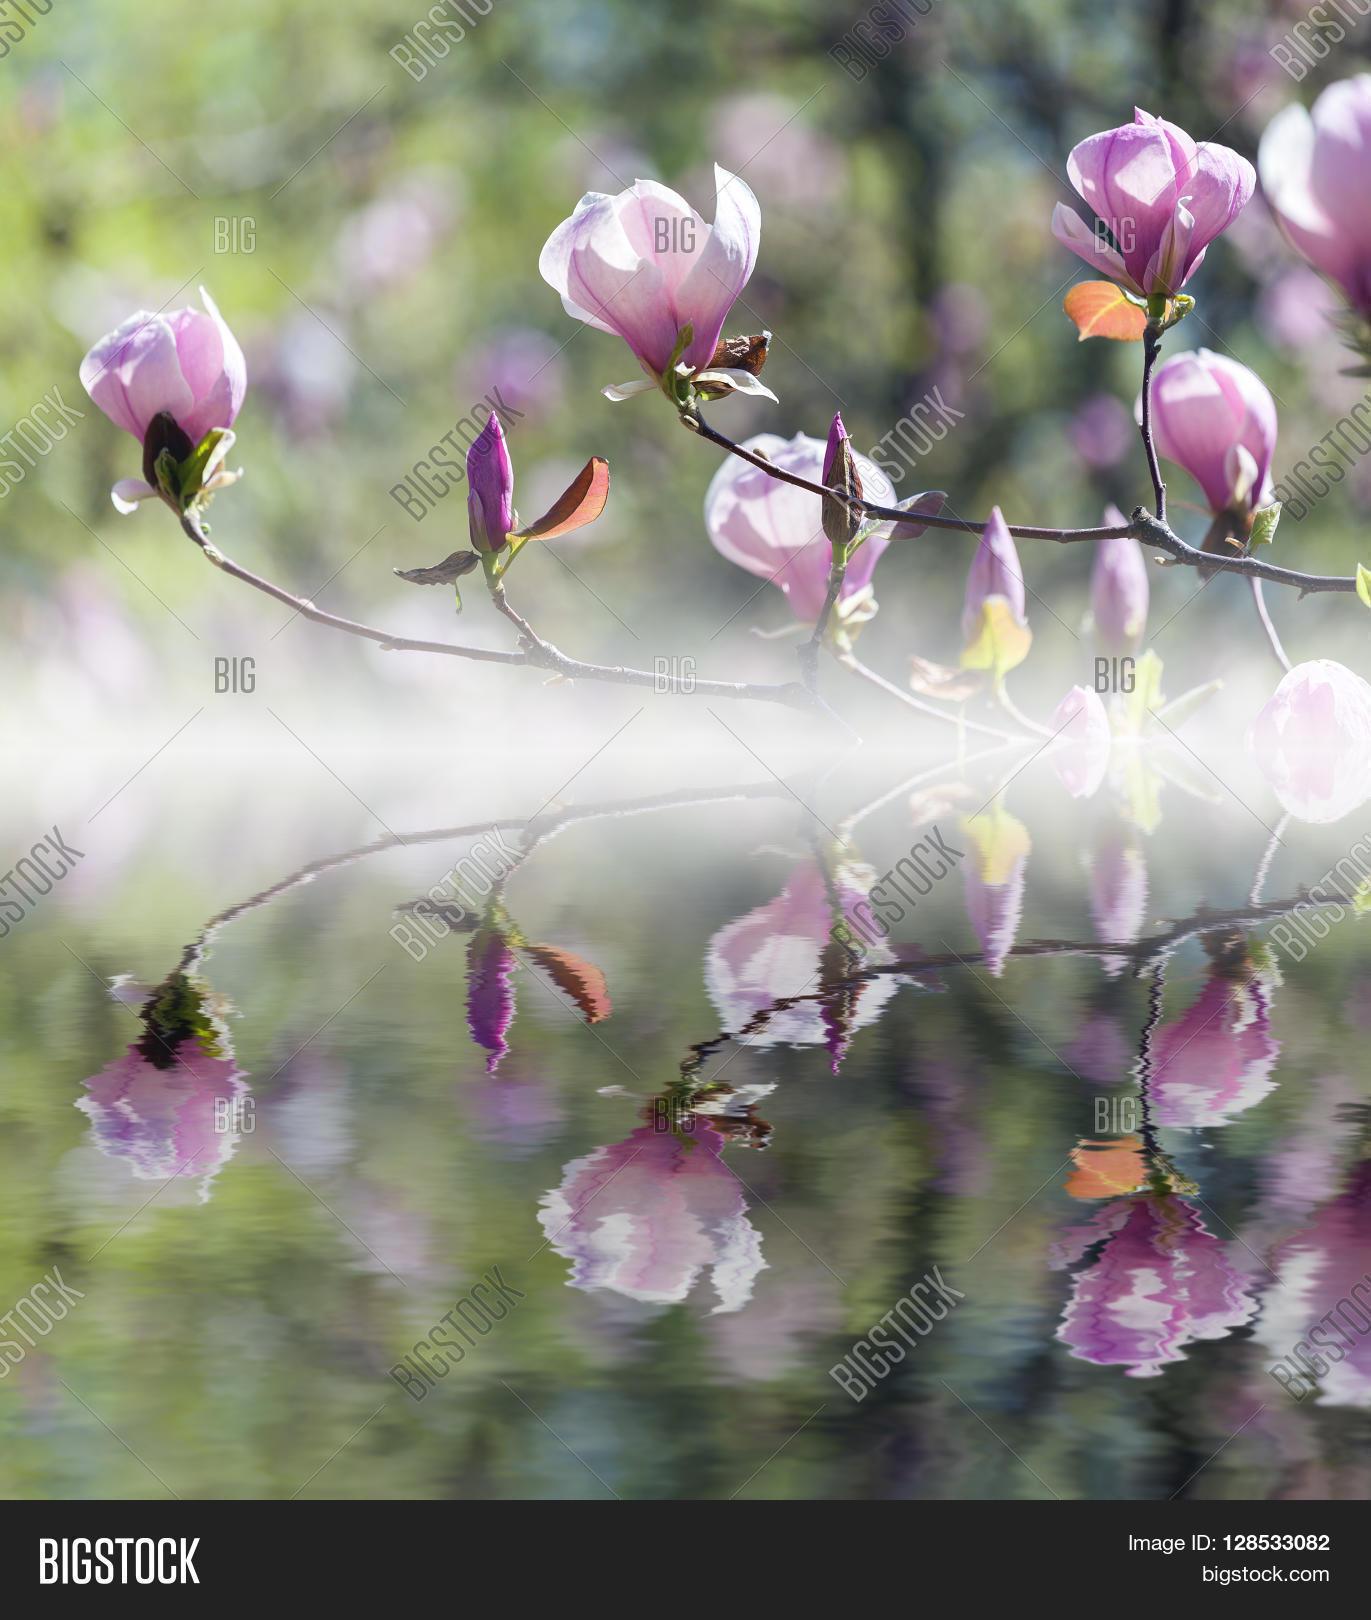 Bloomy magnolia tree image photo free trial bigstock bloomy magnolia tree with big pink flowers reflected in water mightylinksfo